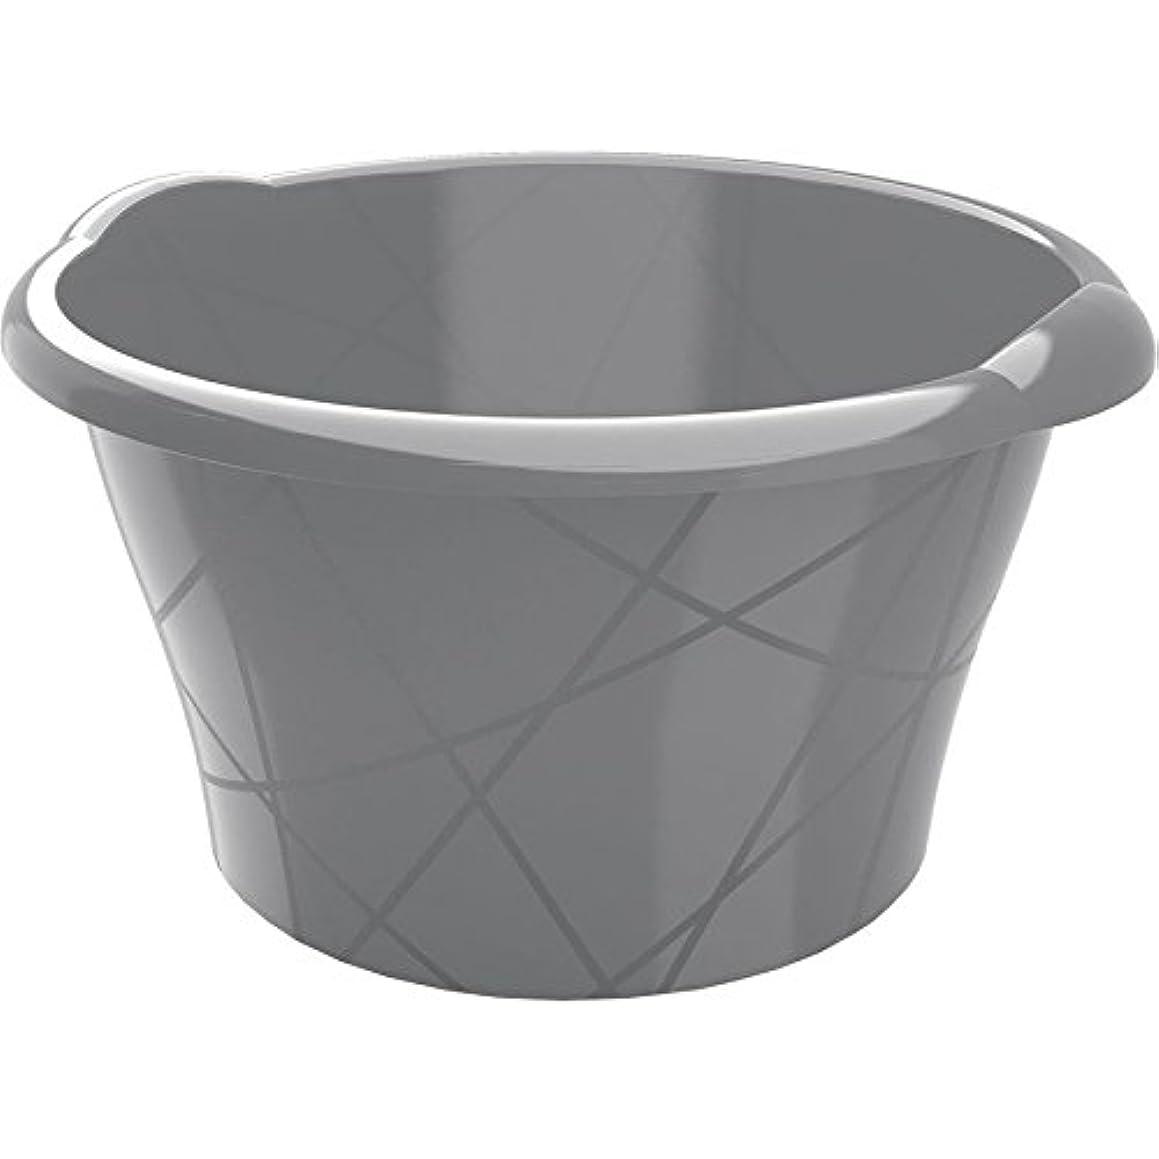 Kis Round Bowl 10 L in Silver, 38 x 36 x 18 cm